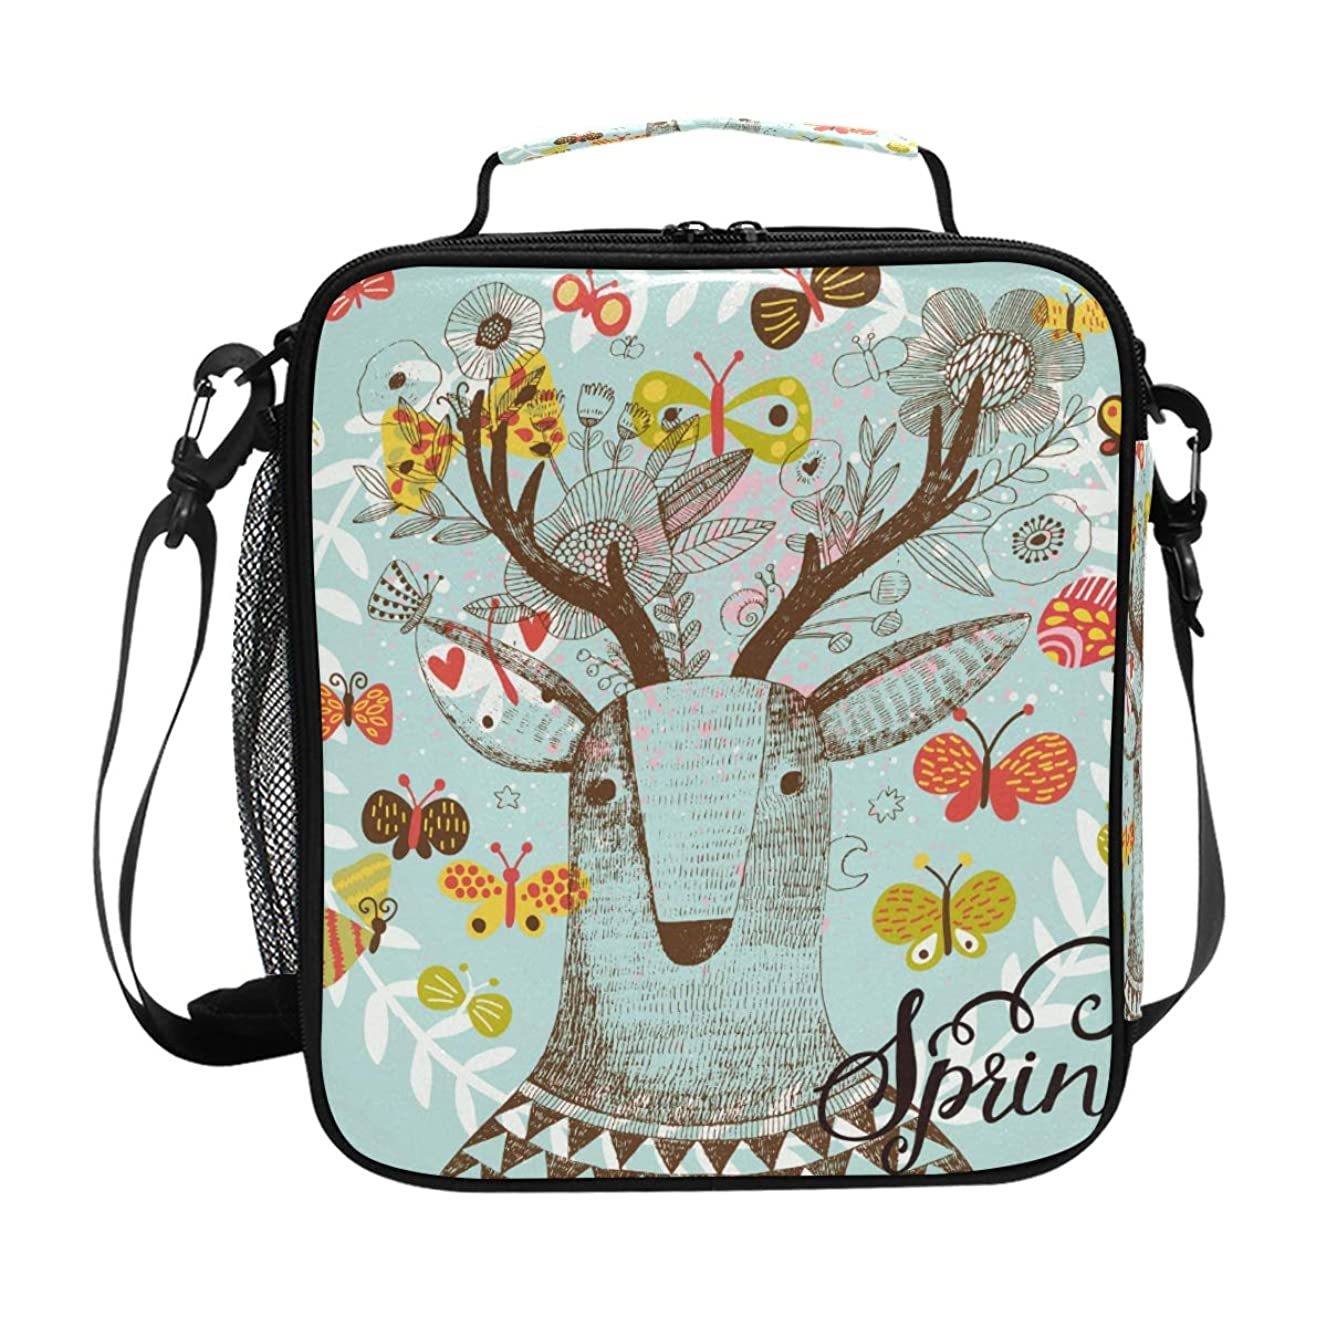 Animal Deer Florals Lunch Bag Insulated Lunch Box Cooler Shoulder Strap Meal Prep for Women Men Boy Girl Large Tote Bag School Office